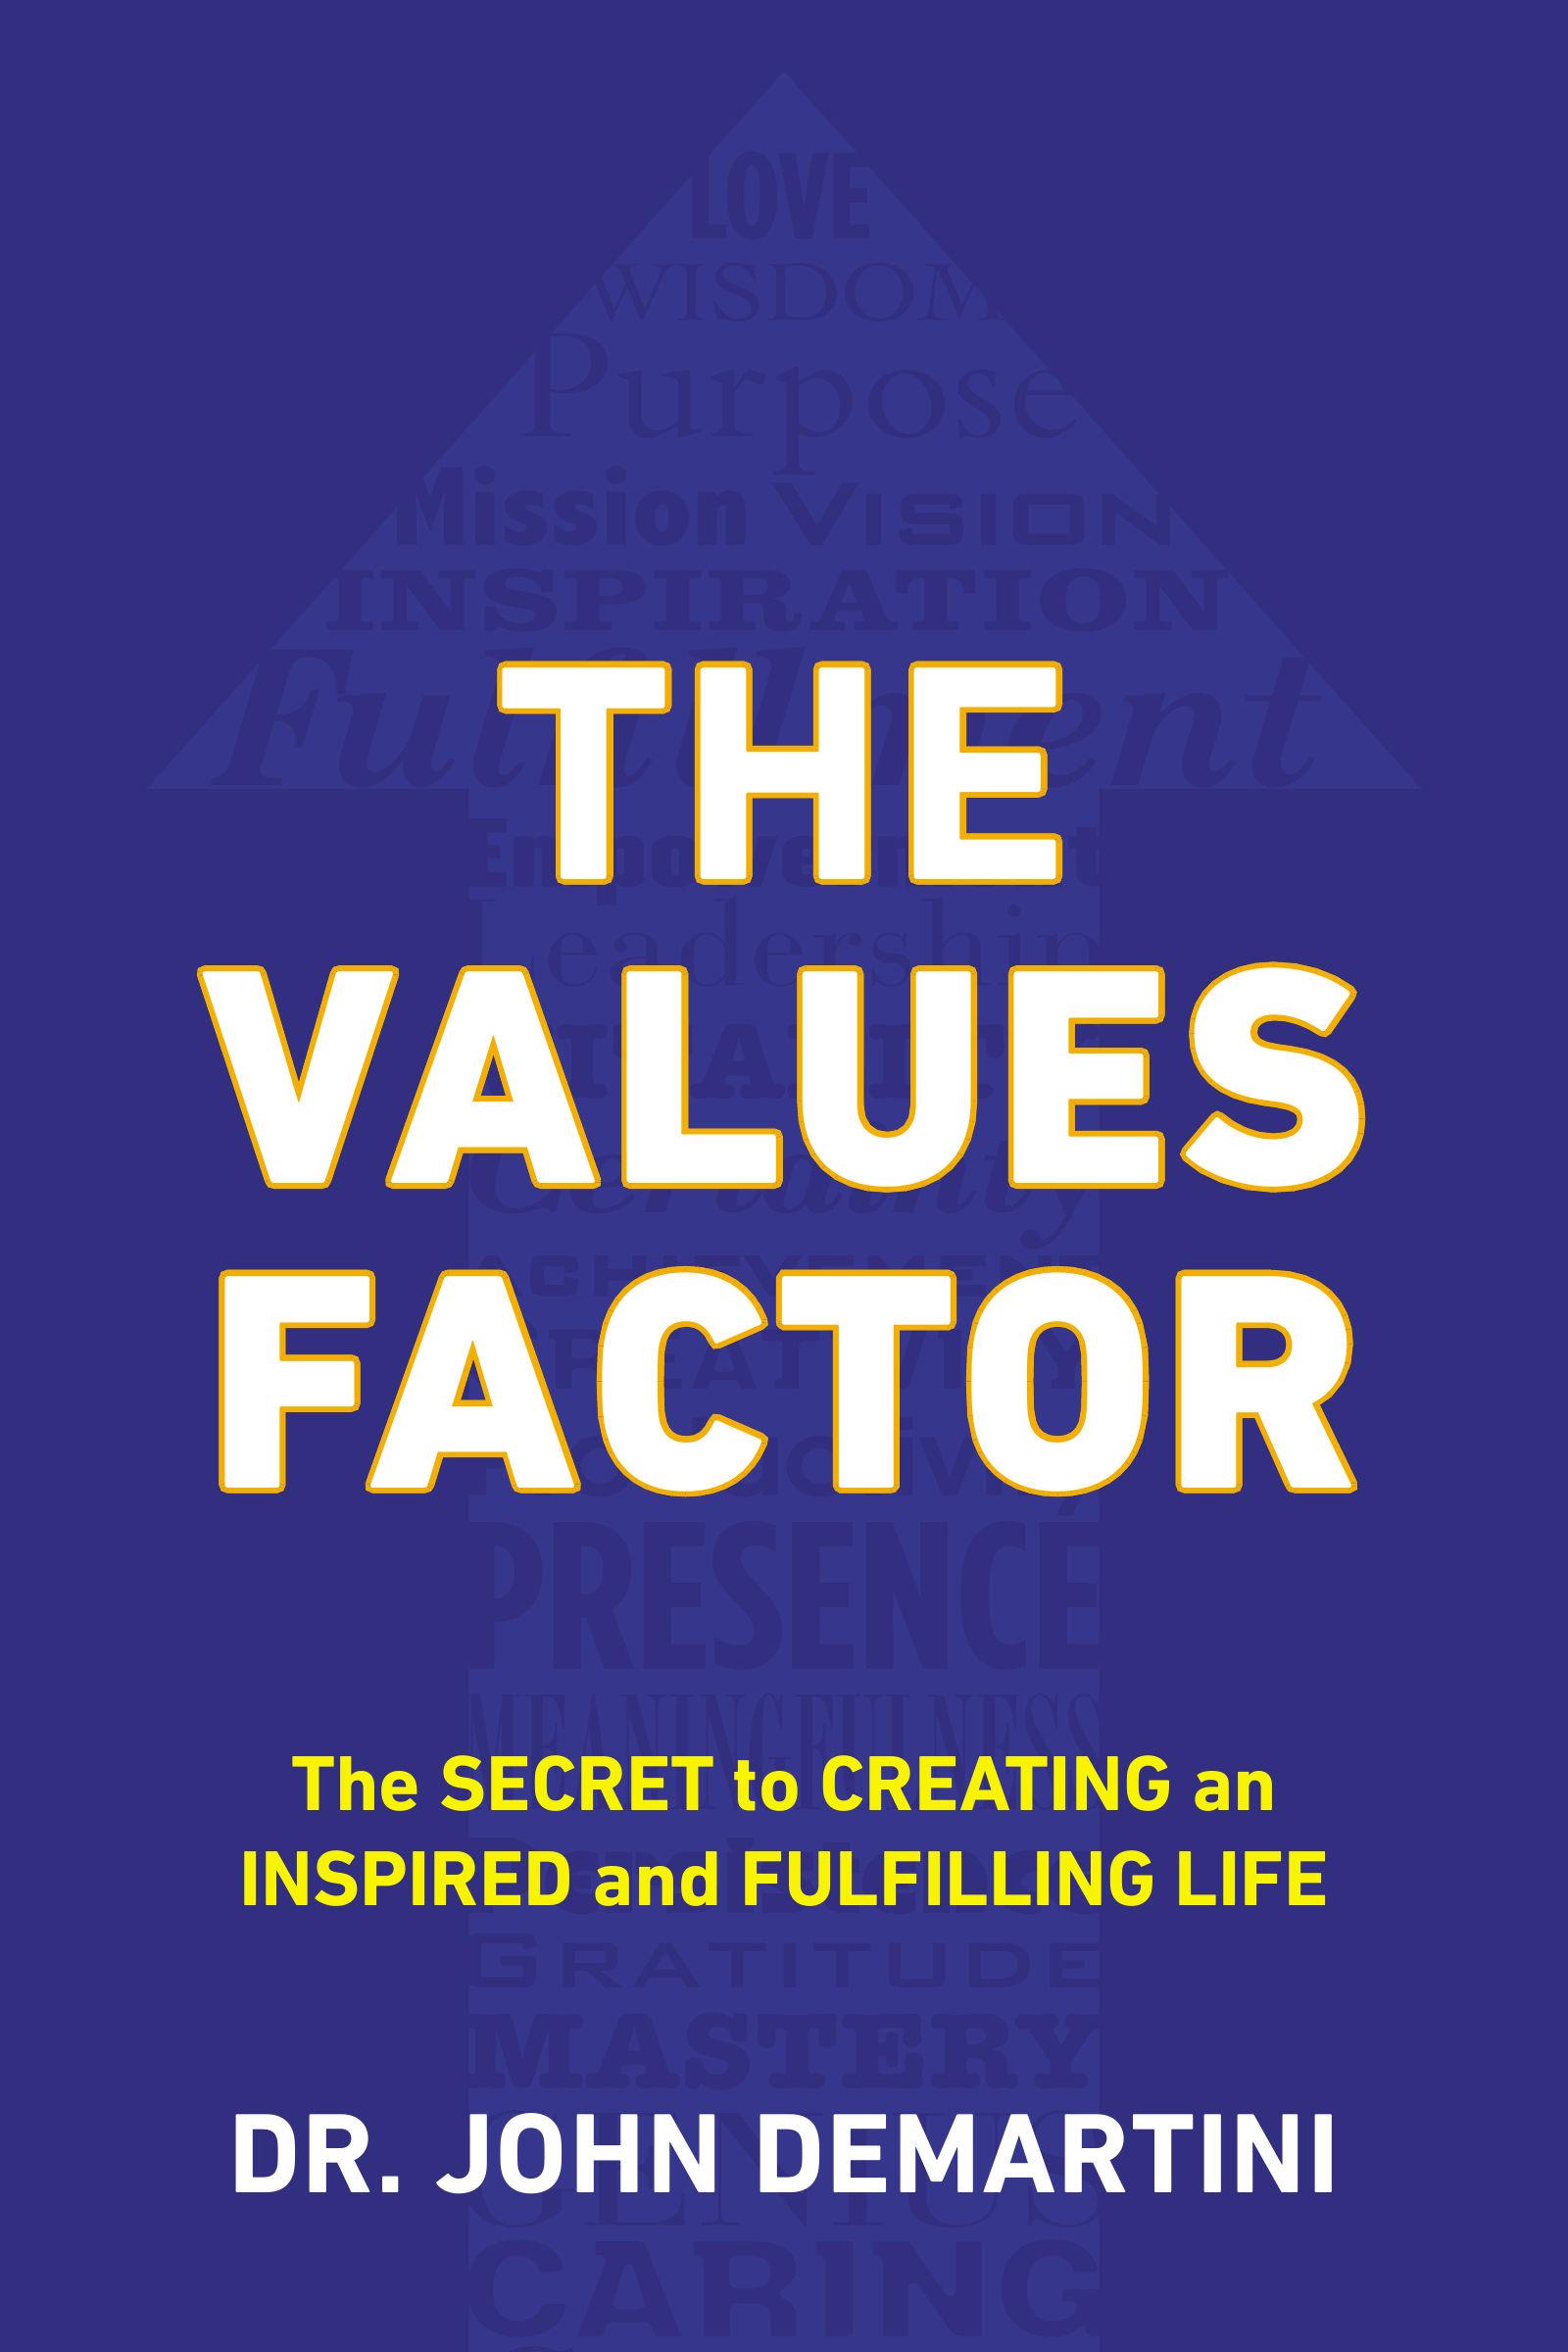 thevaluesfactor.jpg